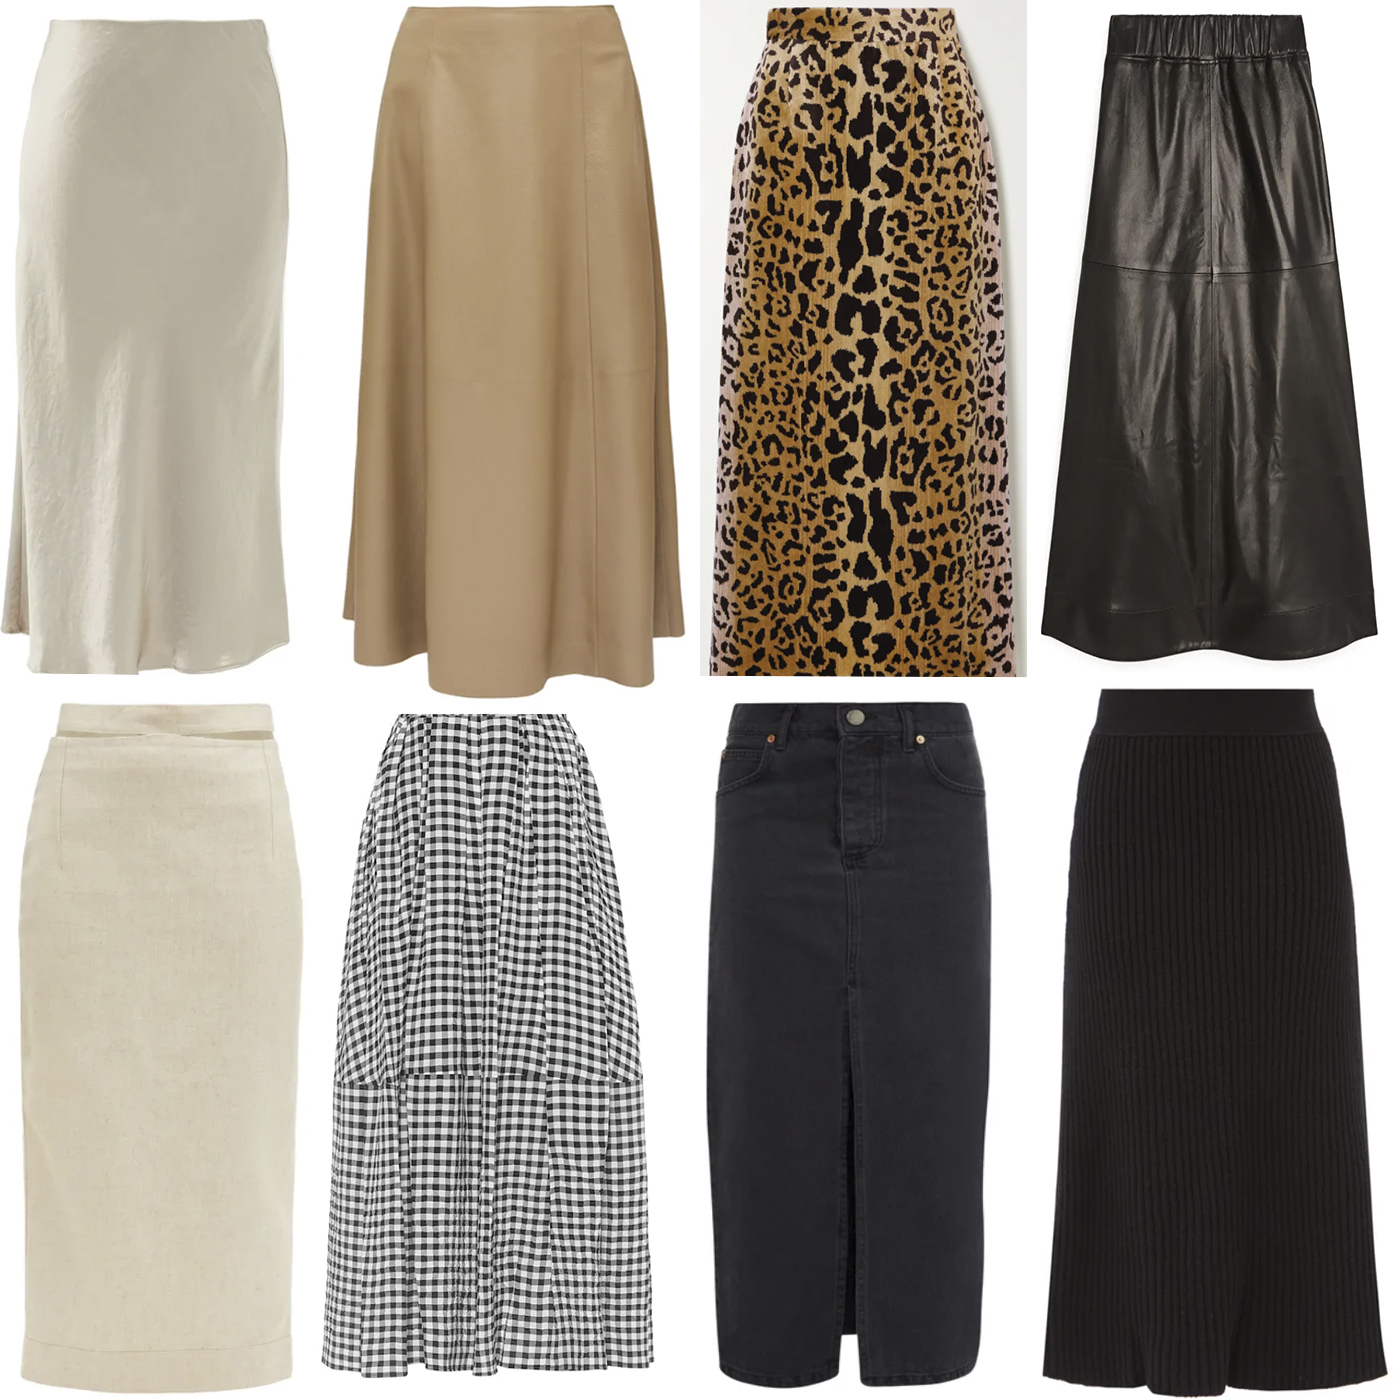 Trini | Fall 2020 skirts